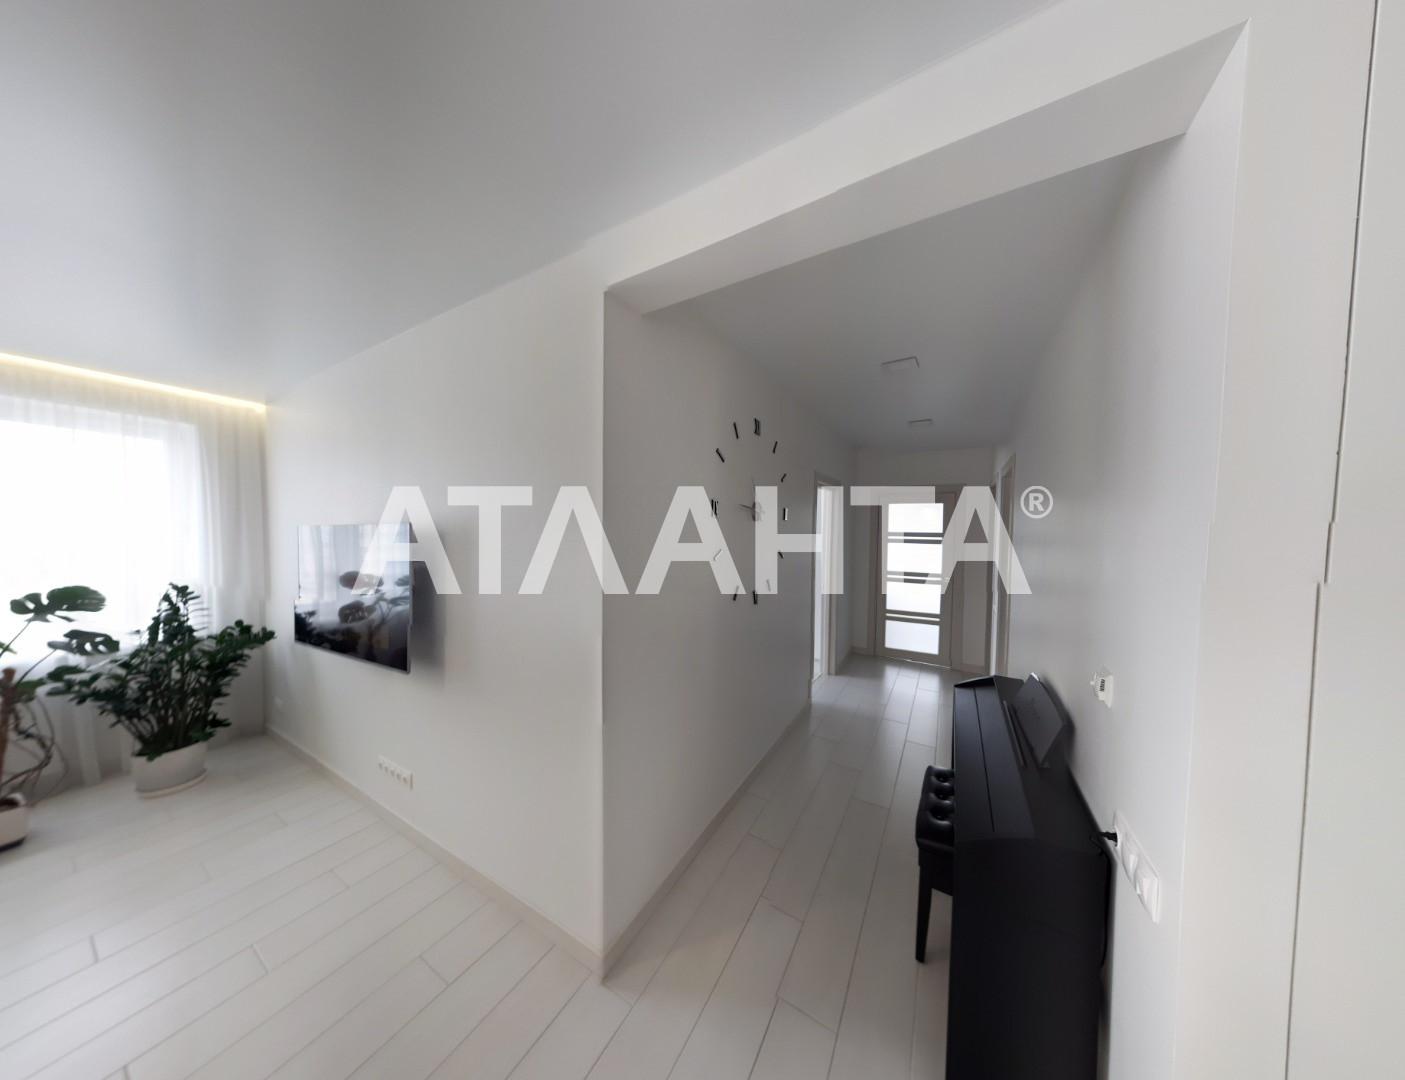 Продается 3-комнатная Квартира на ул. Просп. Глушкова — 160 000 у.е. (фото №23)